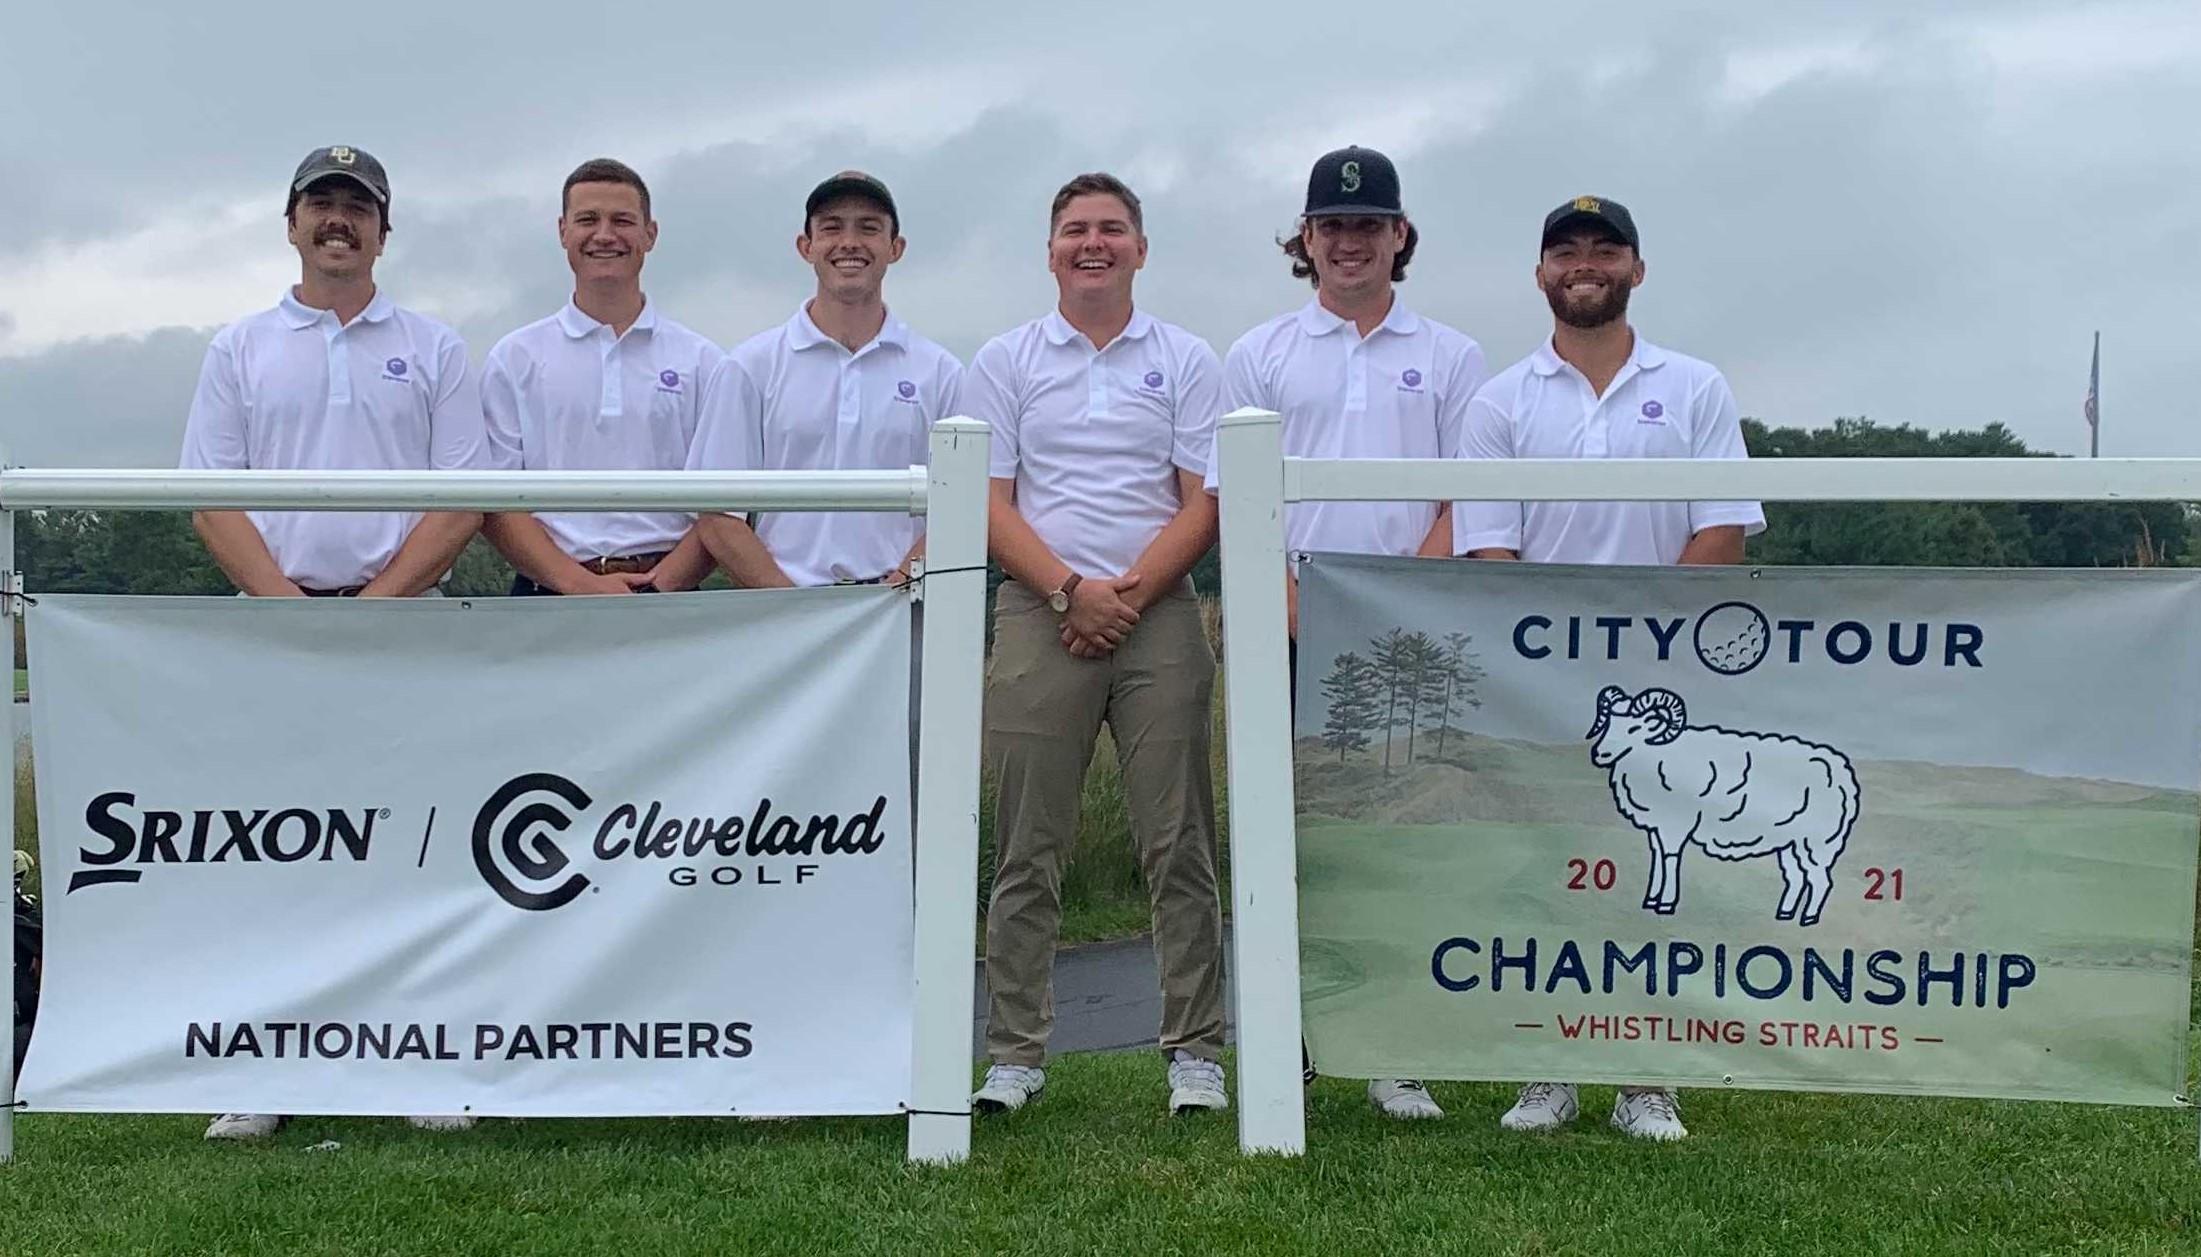 Team Traverse Travels to City Tour Championship